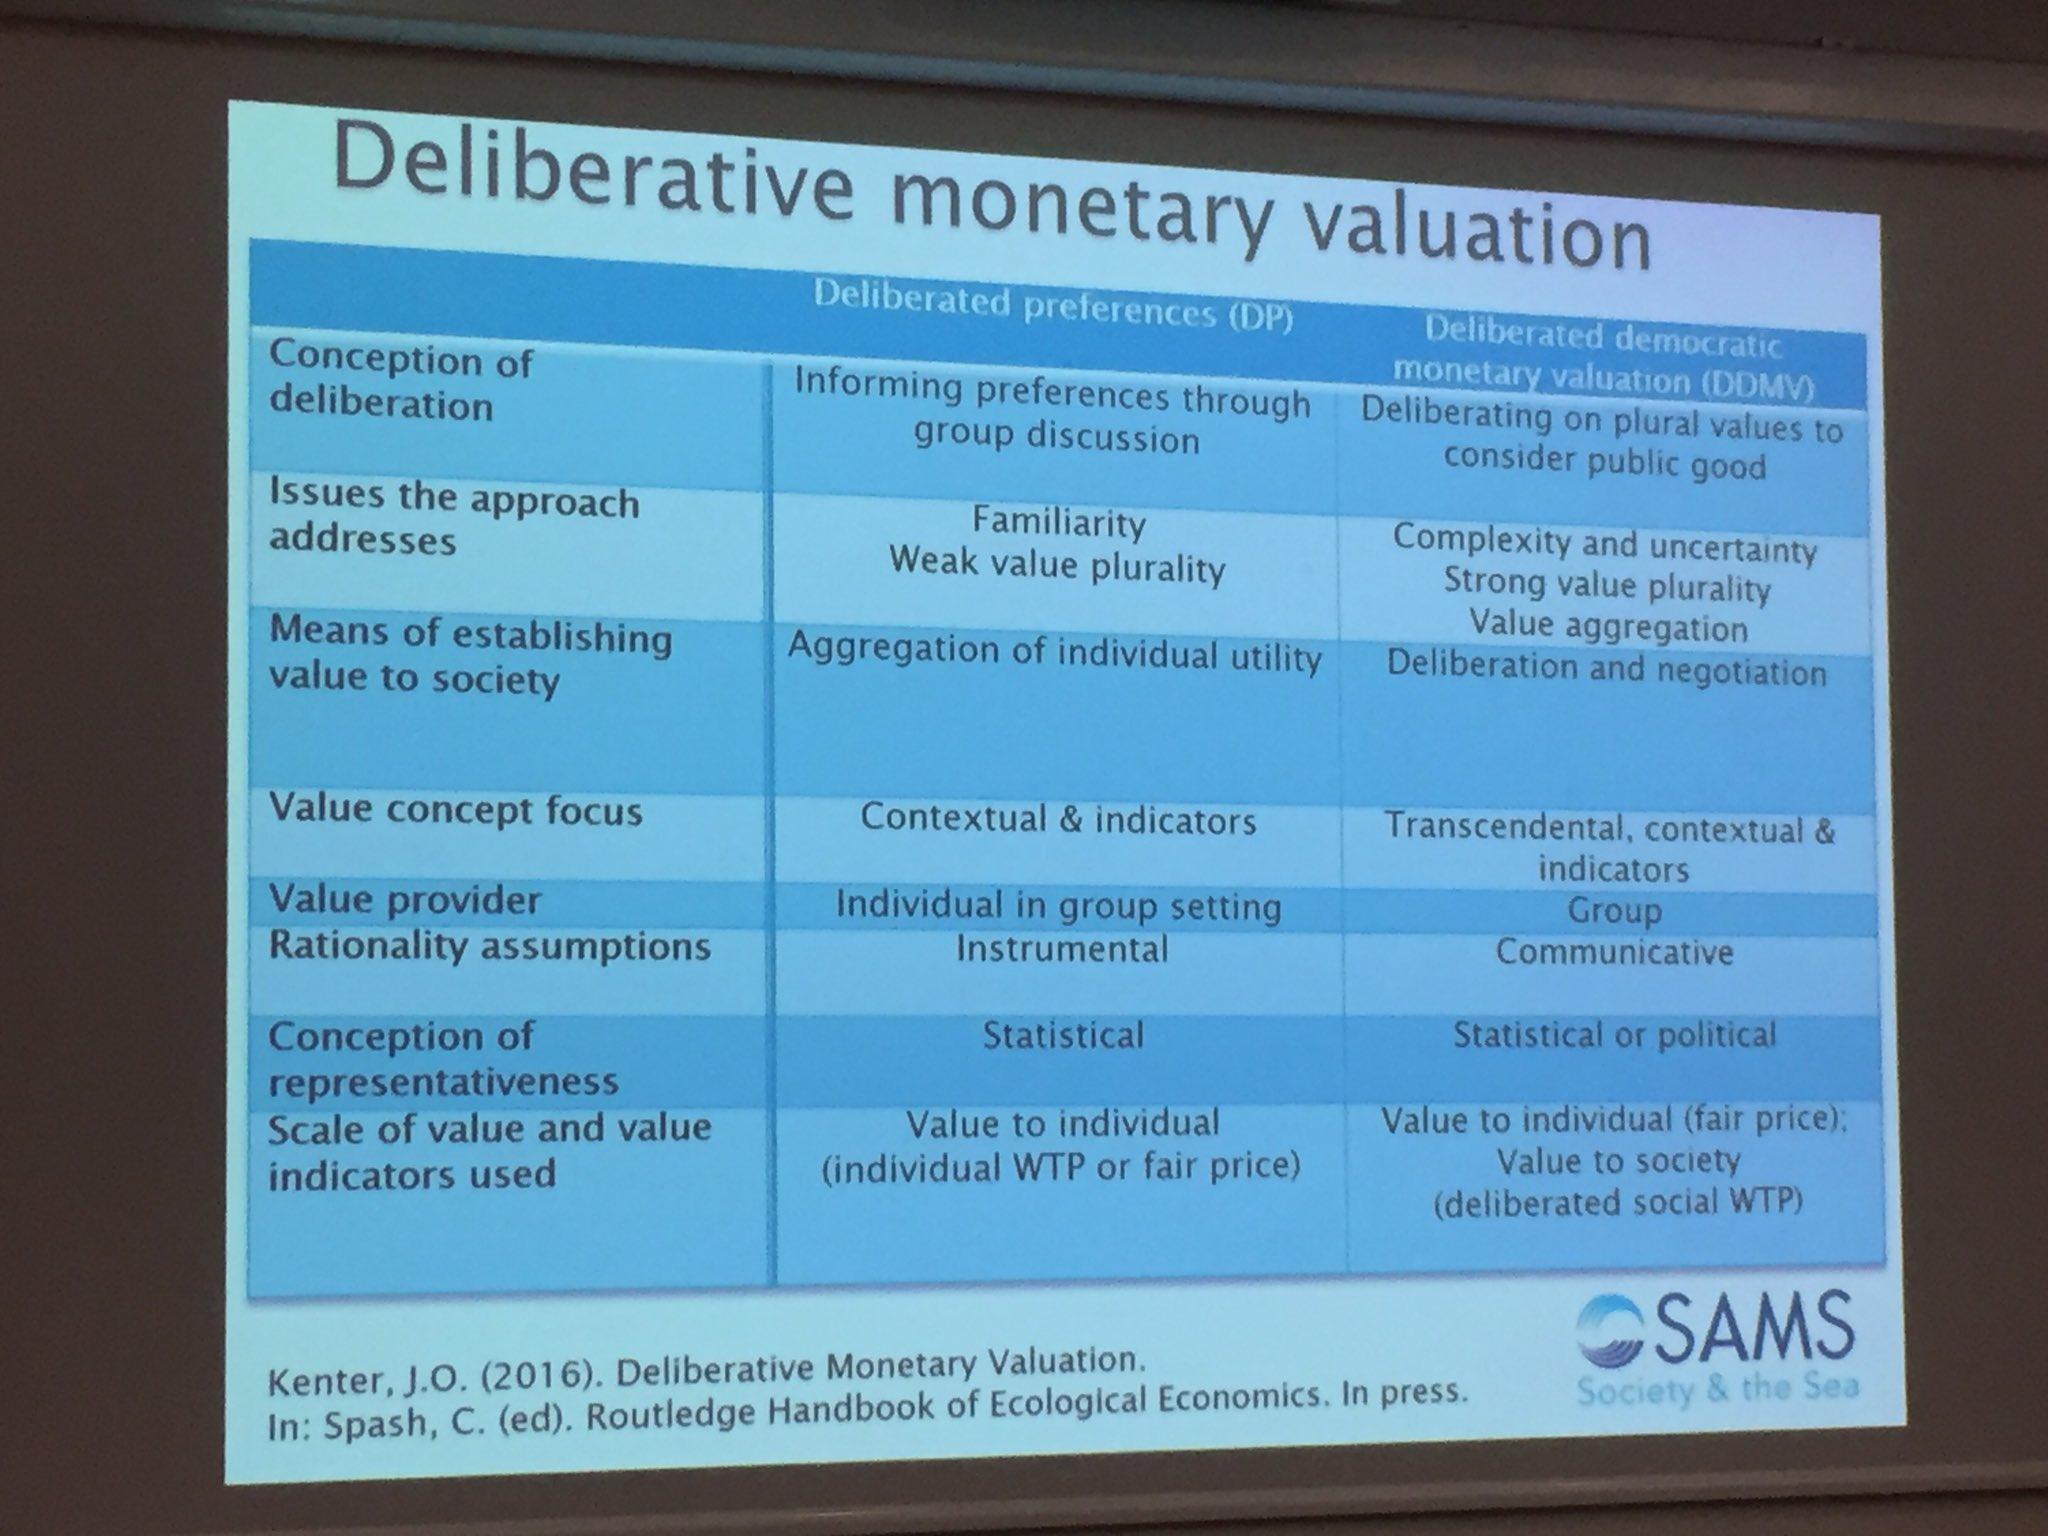 Jasper Kenter contrasts Deliberative Preferences vs Deliberated Democratic Monetary Valuation #ValPart16 https://t.co/nDqvU3Wsyn